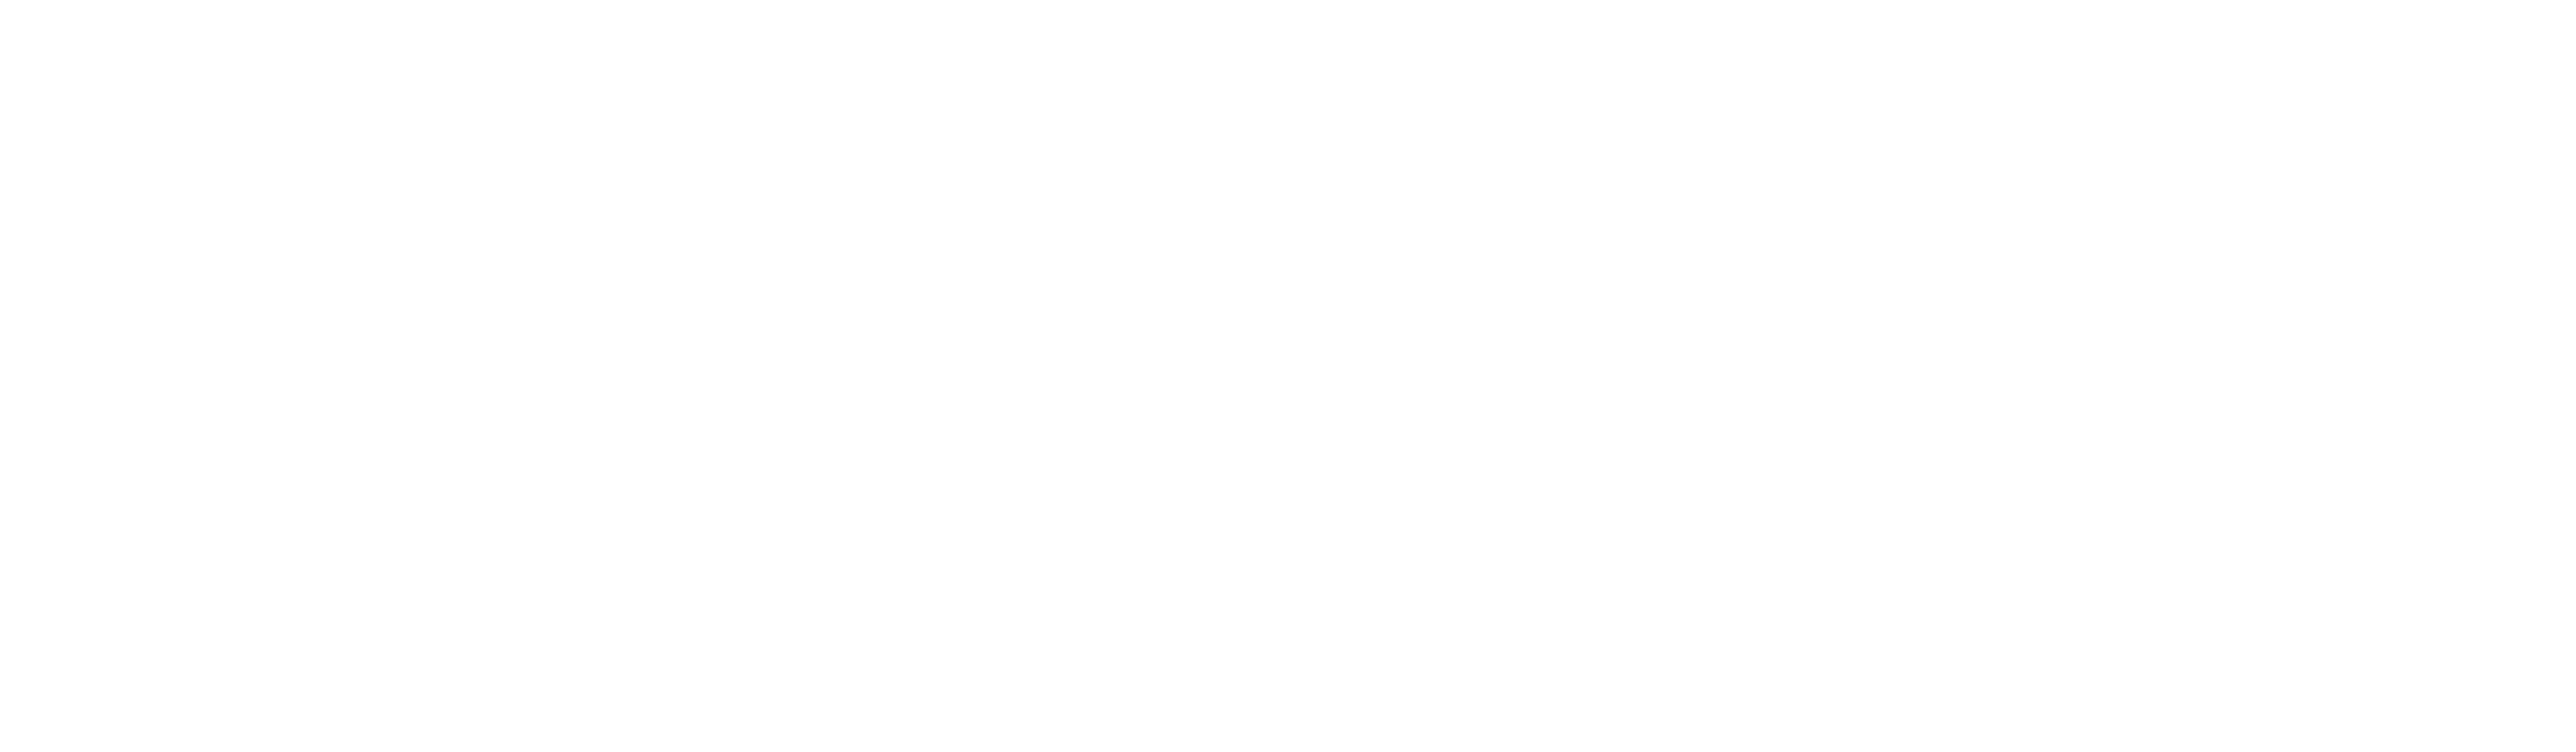 Norville Center logo.